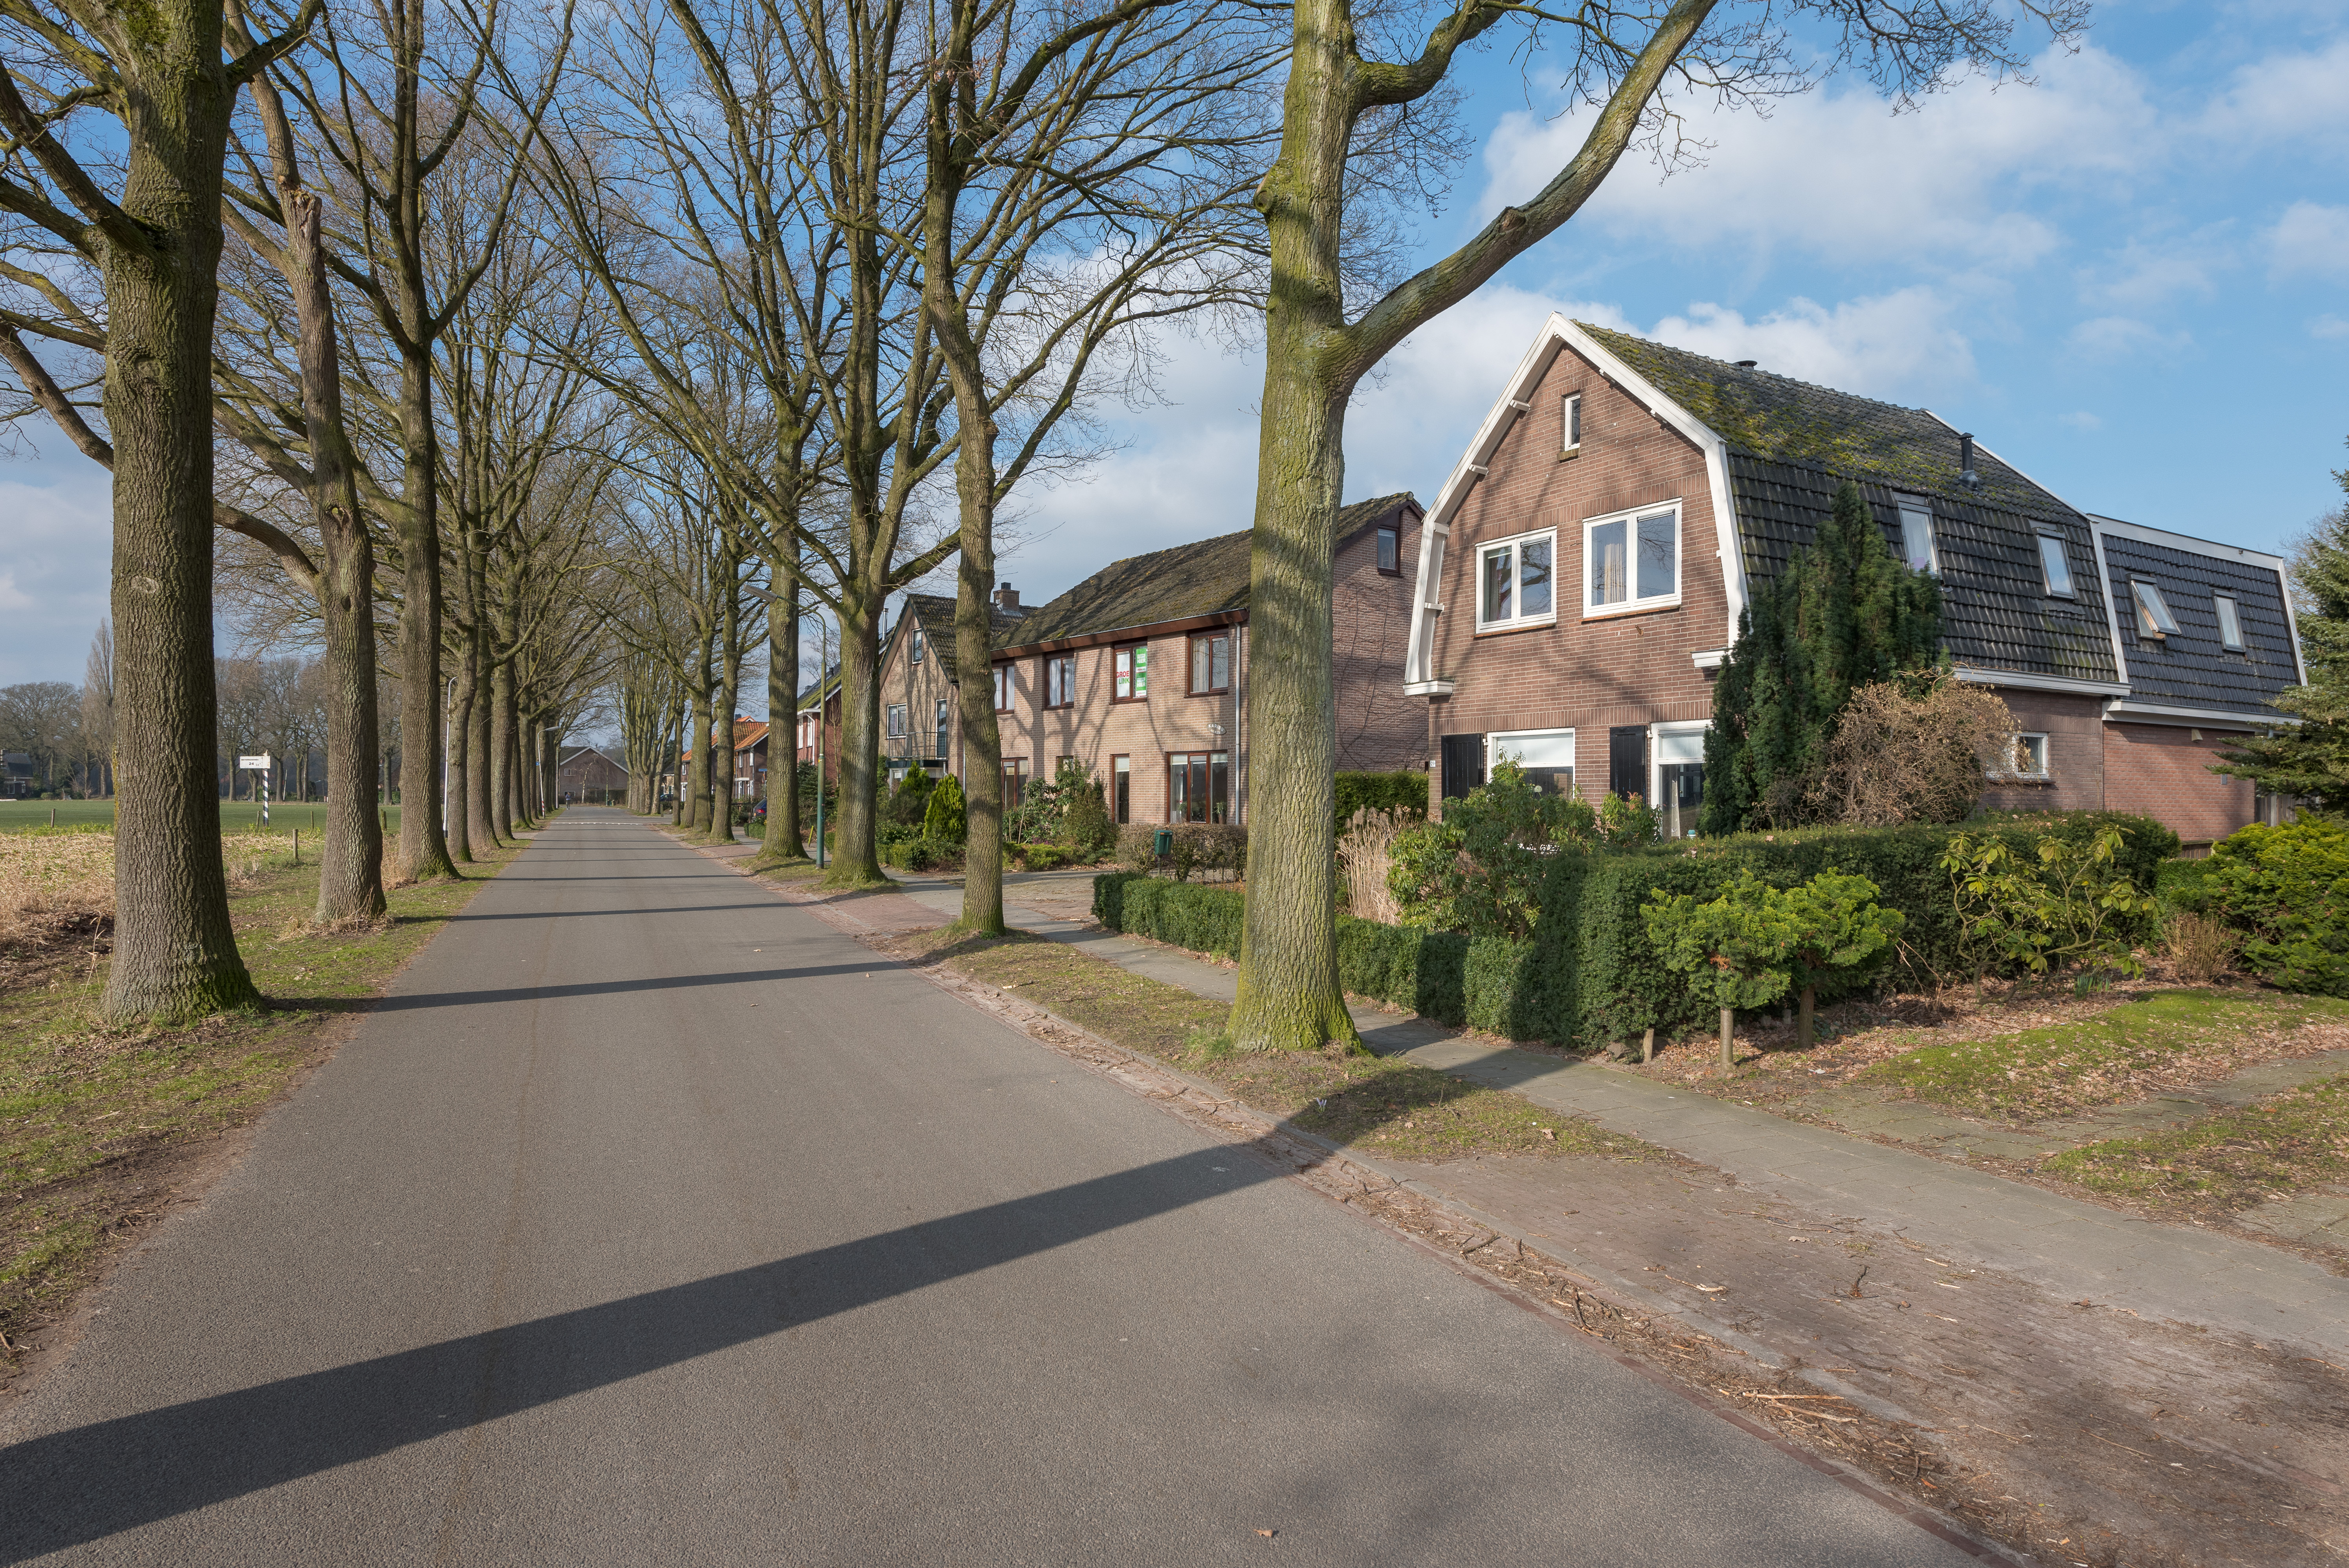 Wetermansweg 29 (31 van 38)